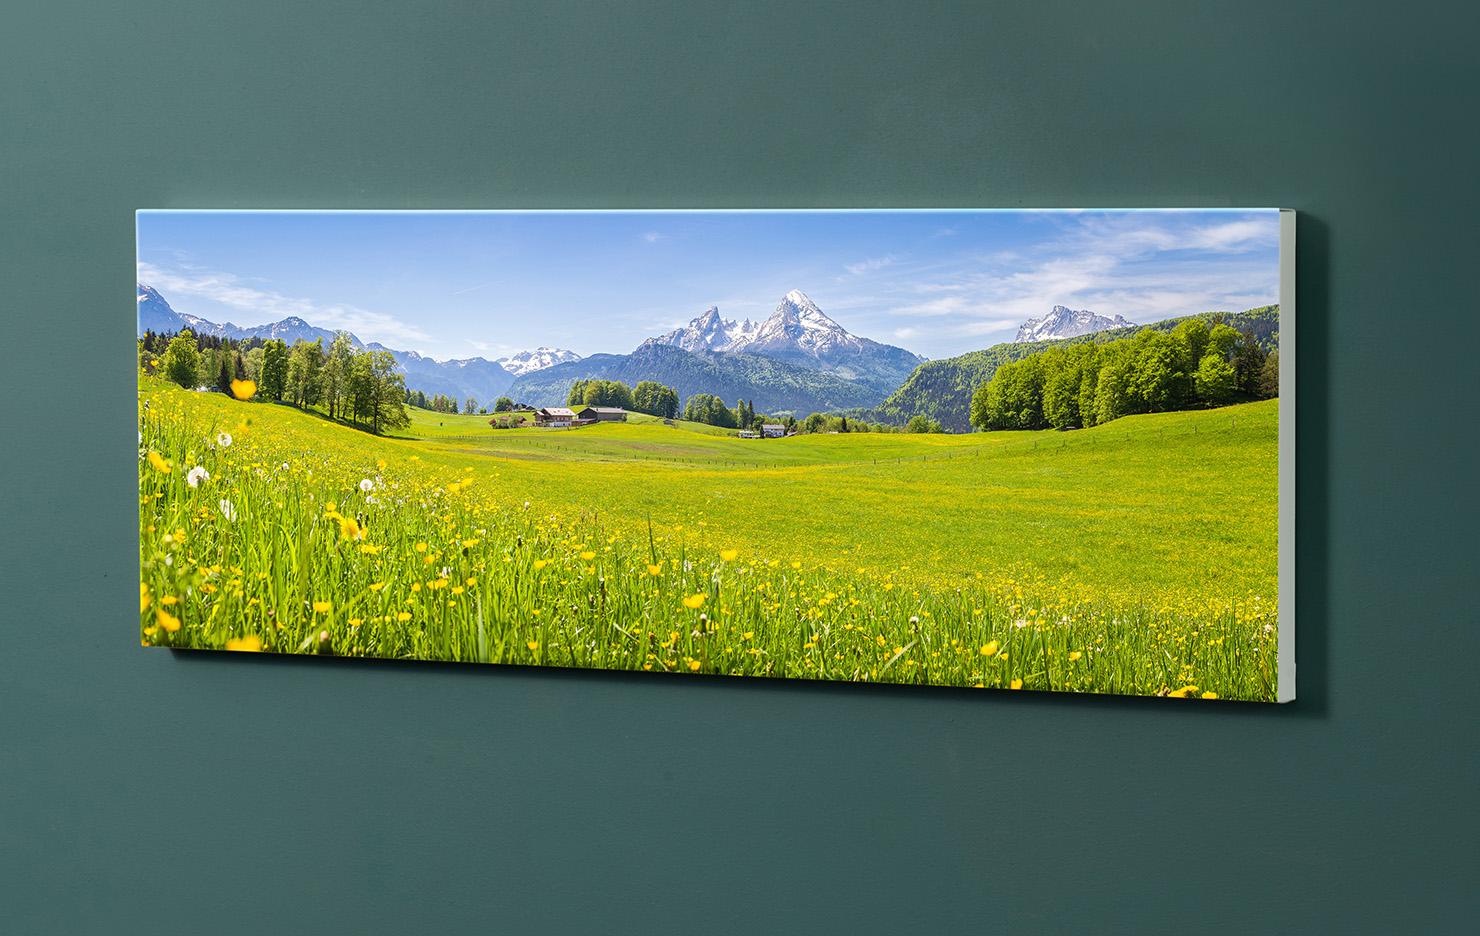 Magnettafel NOTIZ 90x30cm Motiv-Pinnwand M139 Wiese Berge